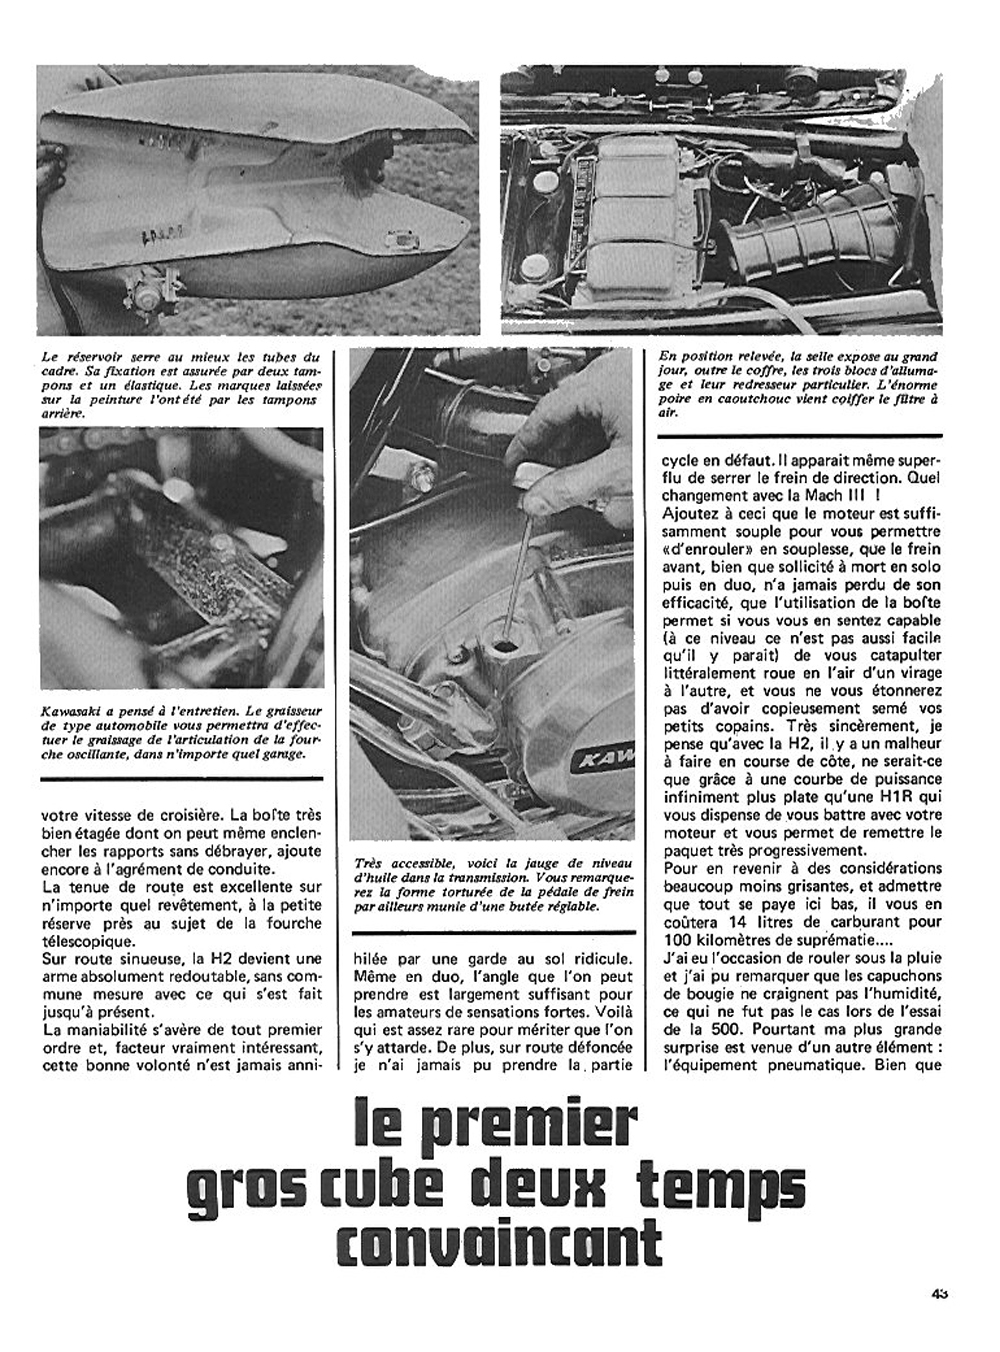 1972 Kawasaki H2 750 road test france 08.jpg